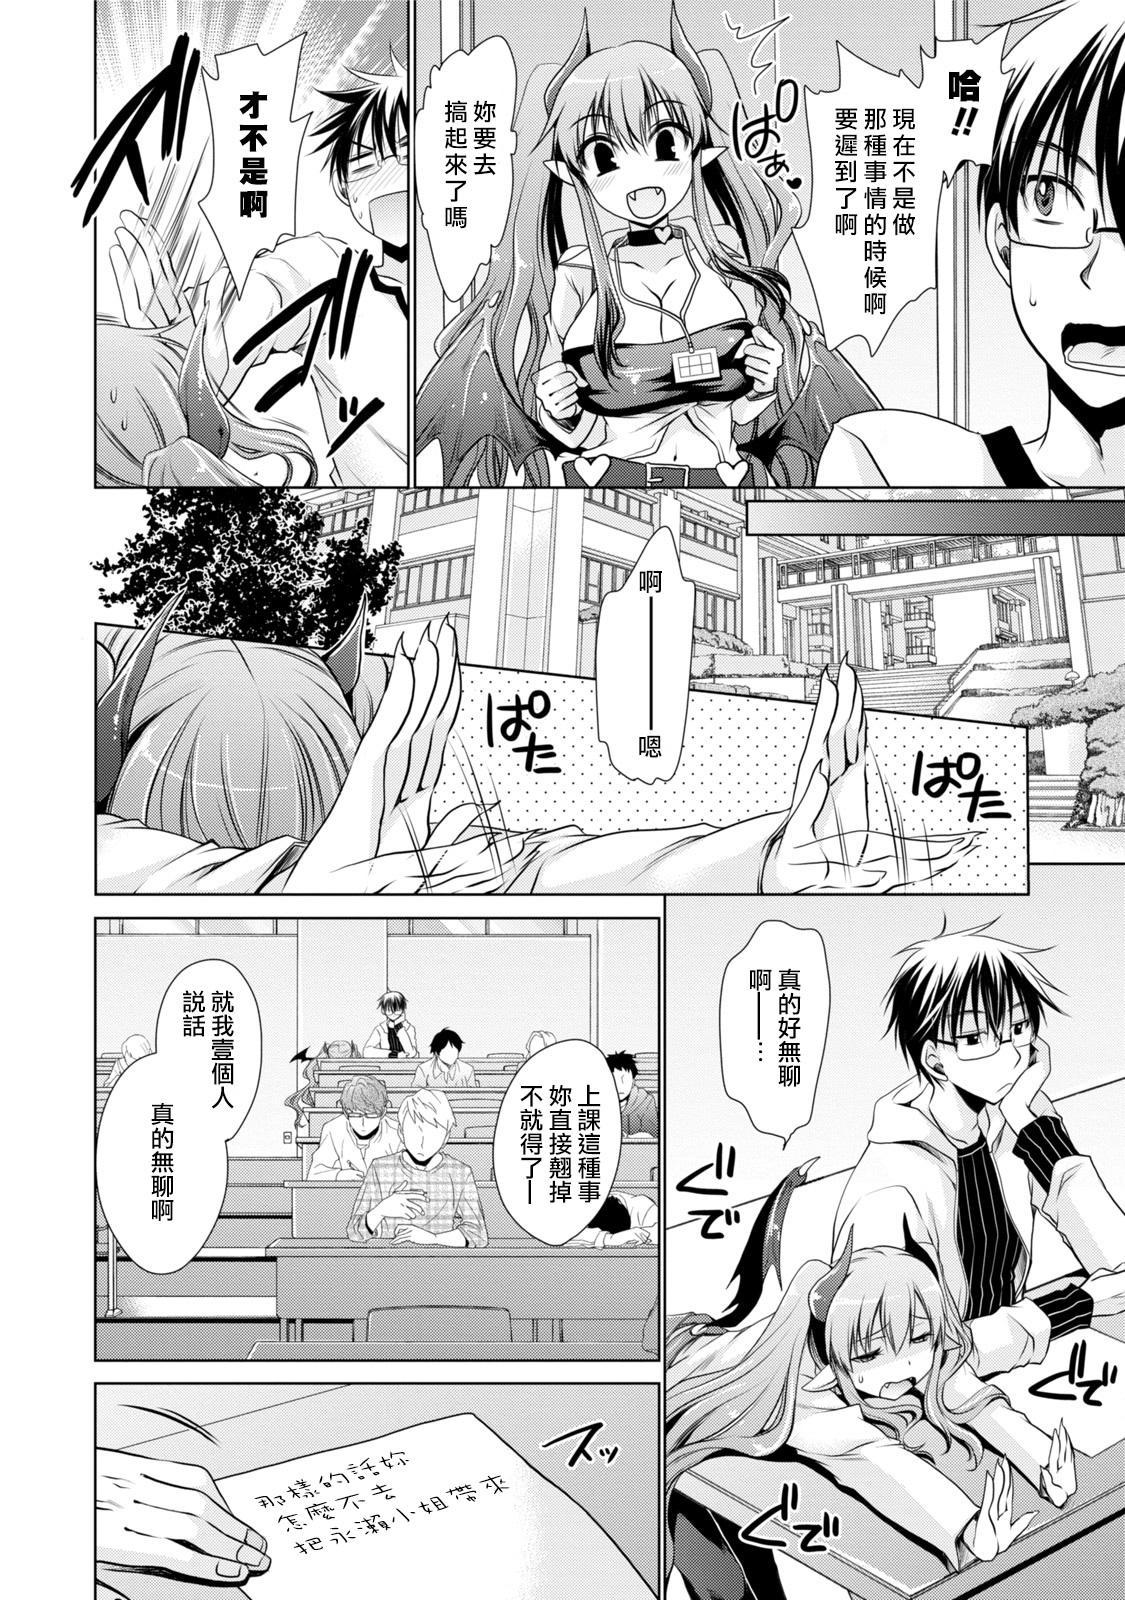 [Shinonome Ryu] Ore to Kanojo to Owaru Sekai - World's end LoveStory ch.1-9 [Chinese] [爱弹幕汉化组] [Digital] 71